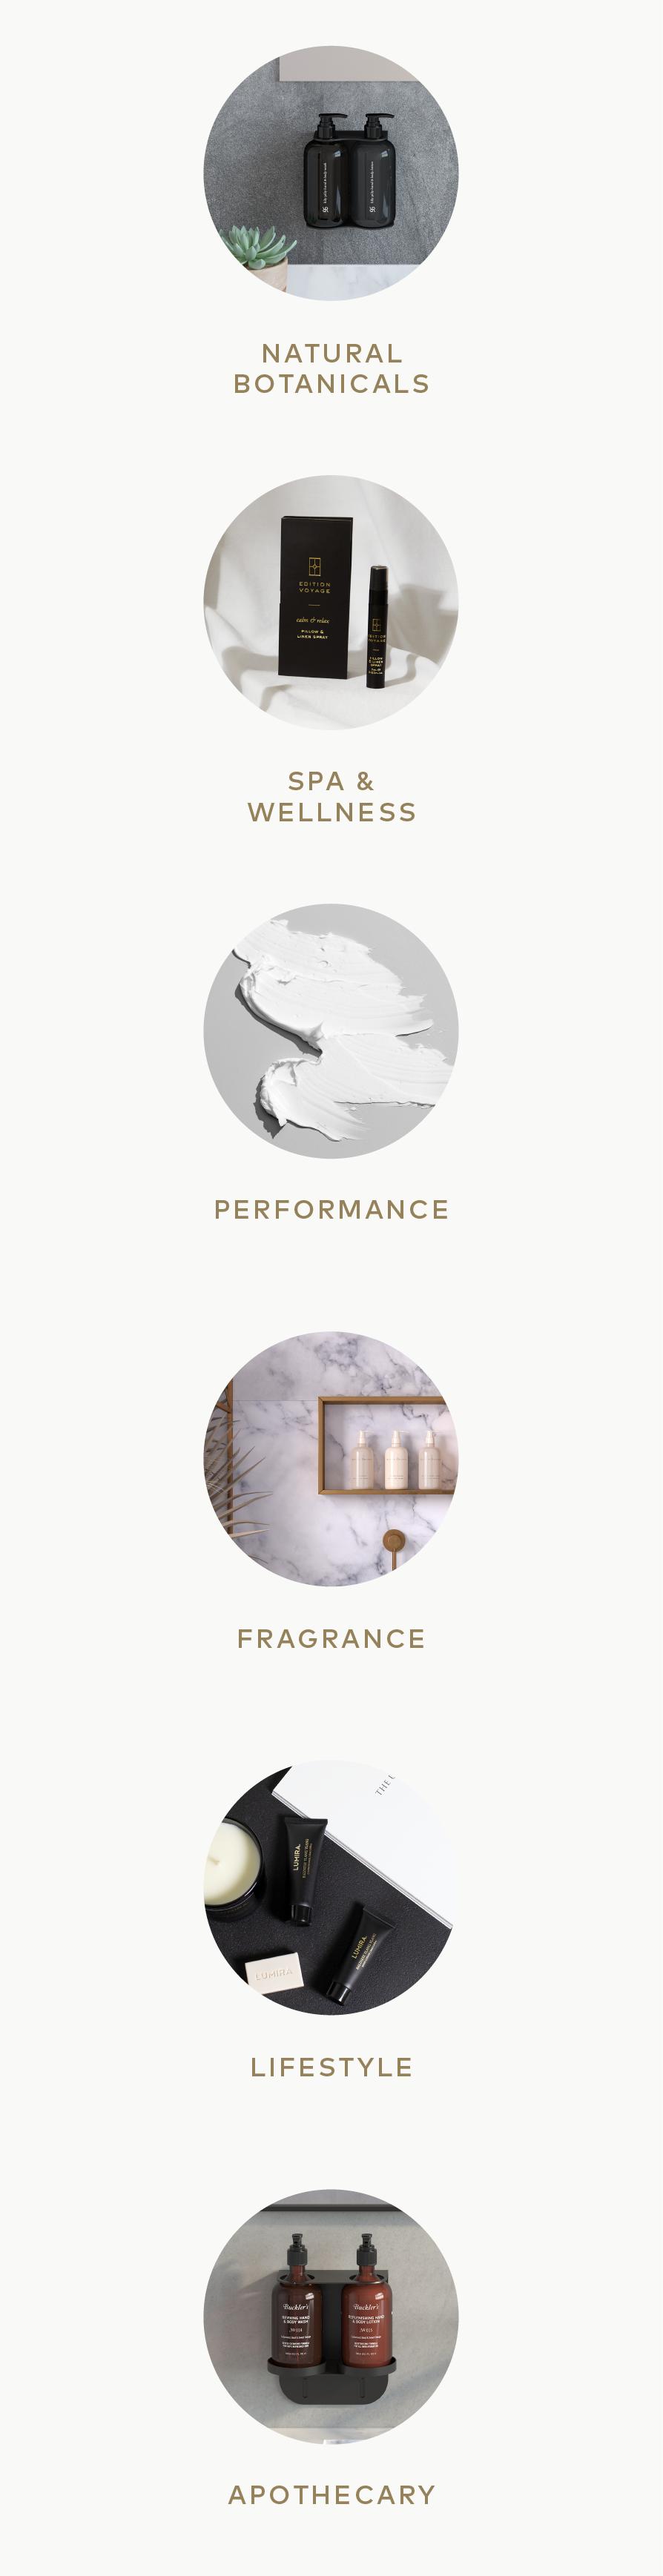 Hotel Portfolio - Botanicals, Performance, Lifestyle, Spa and Wellness, Fragrance, Apothecary